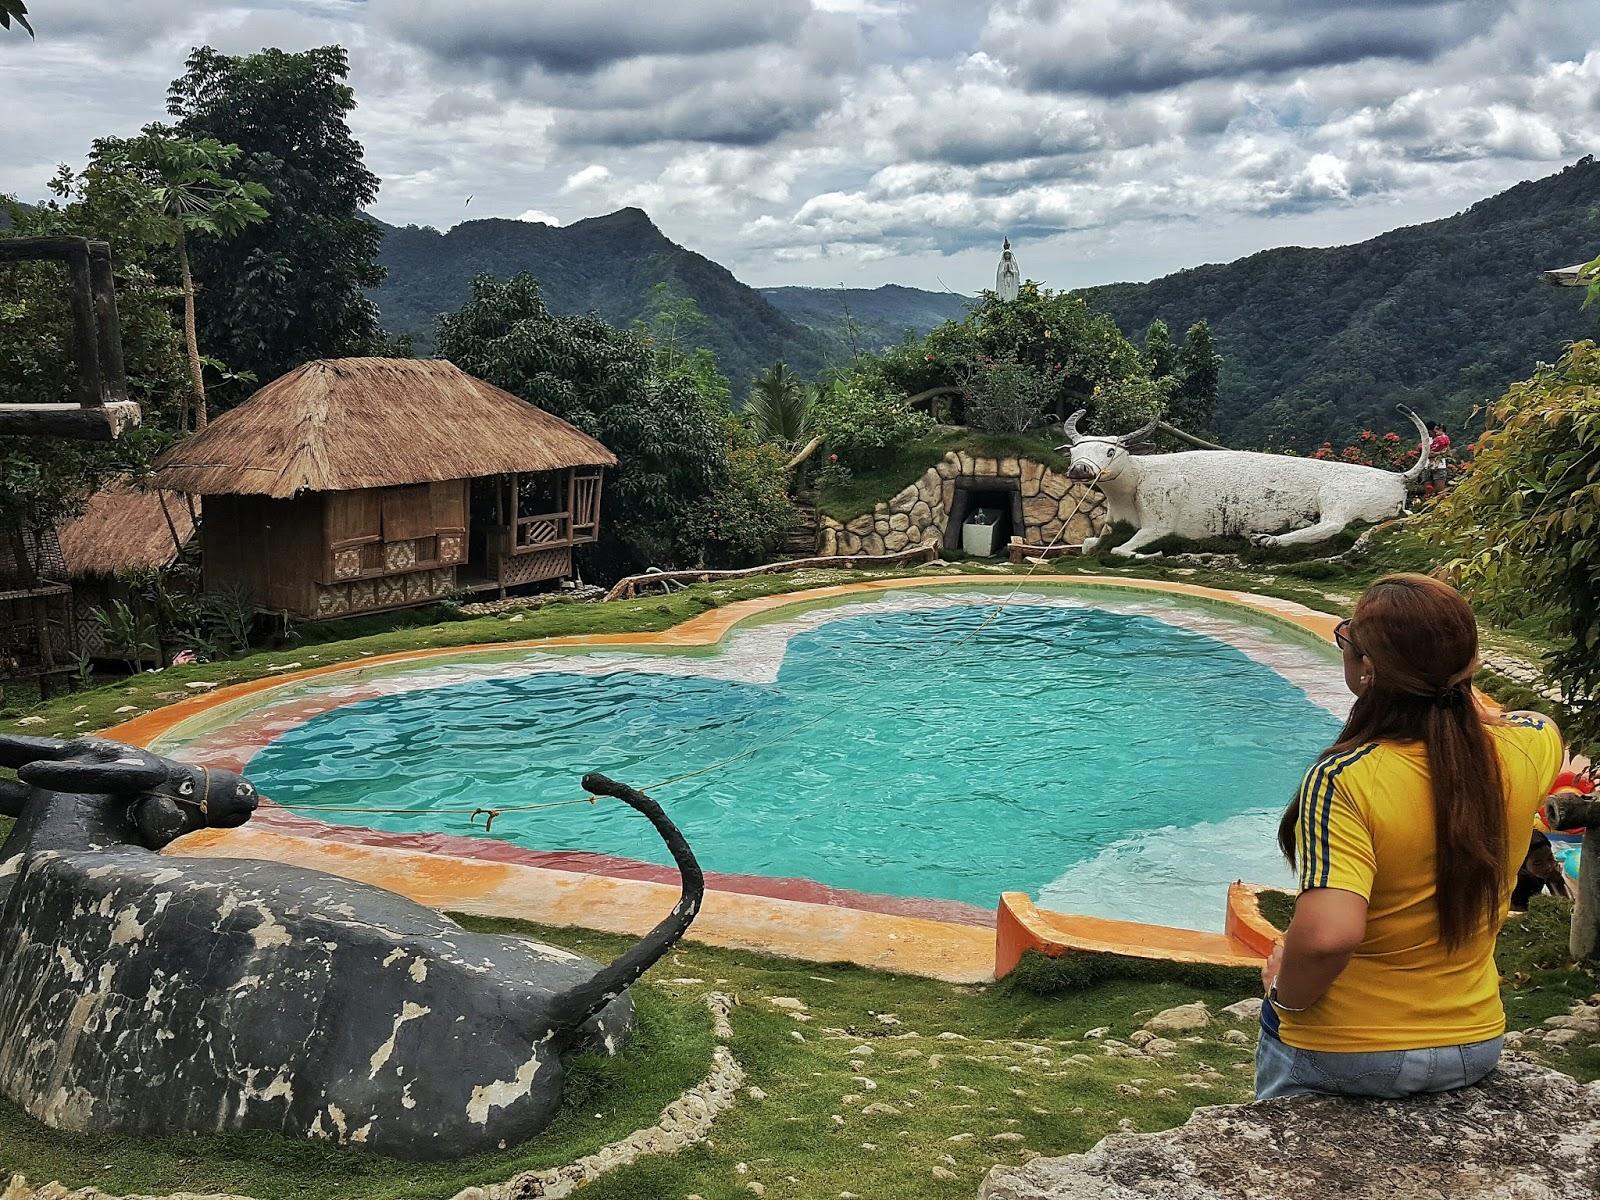 Heart Shaped Pool At Coal Mountain Resort   Argao, Cebu